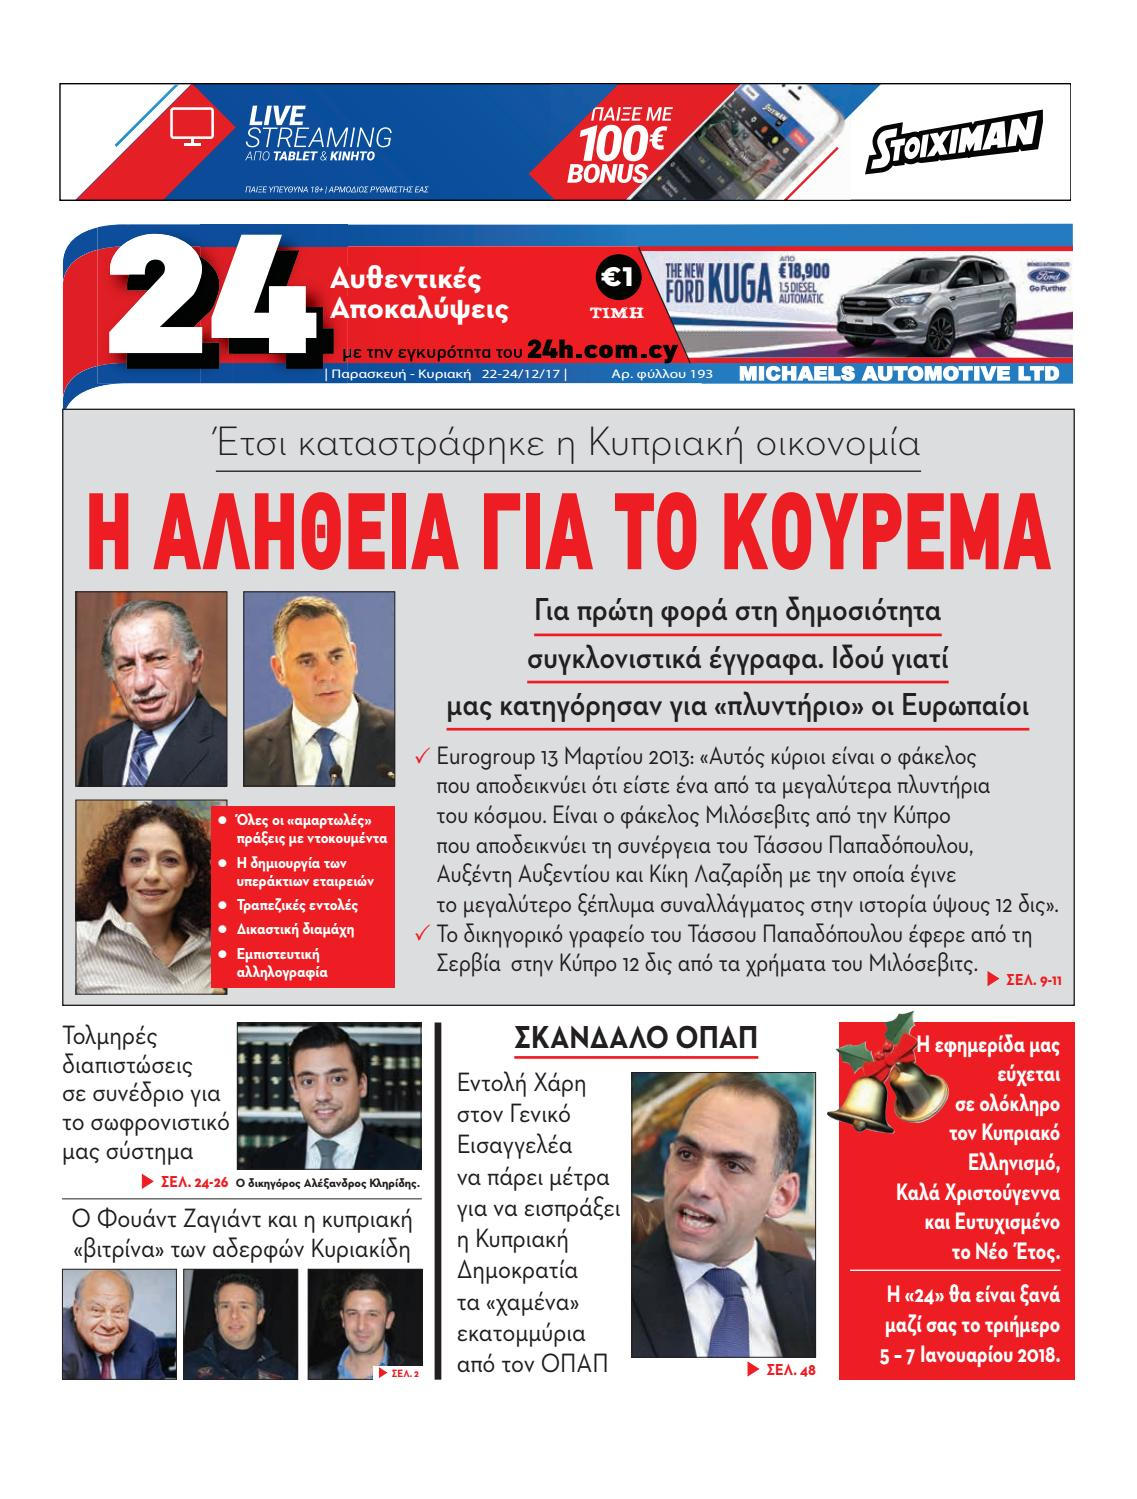 7e2c586b159 Εφημερίδα 24 - Φύλλο 193 - 22 Δεκεμβρίου 2017 by Newspaper 24 - issuu